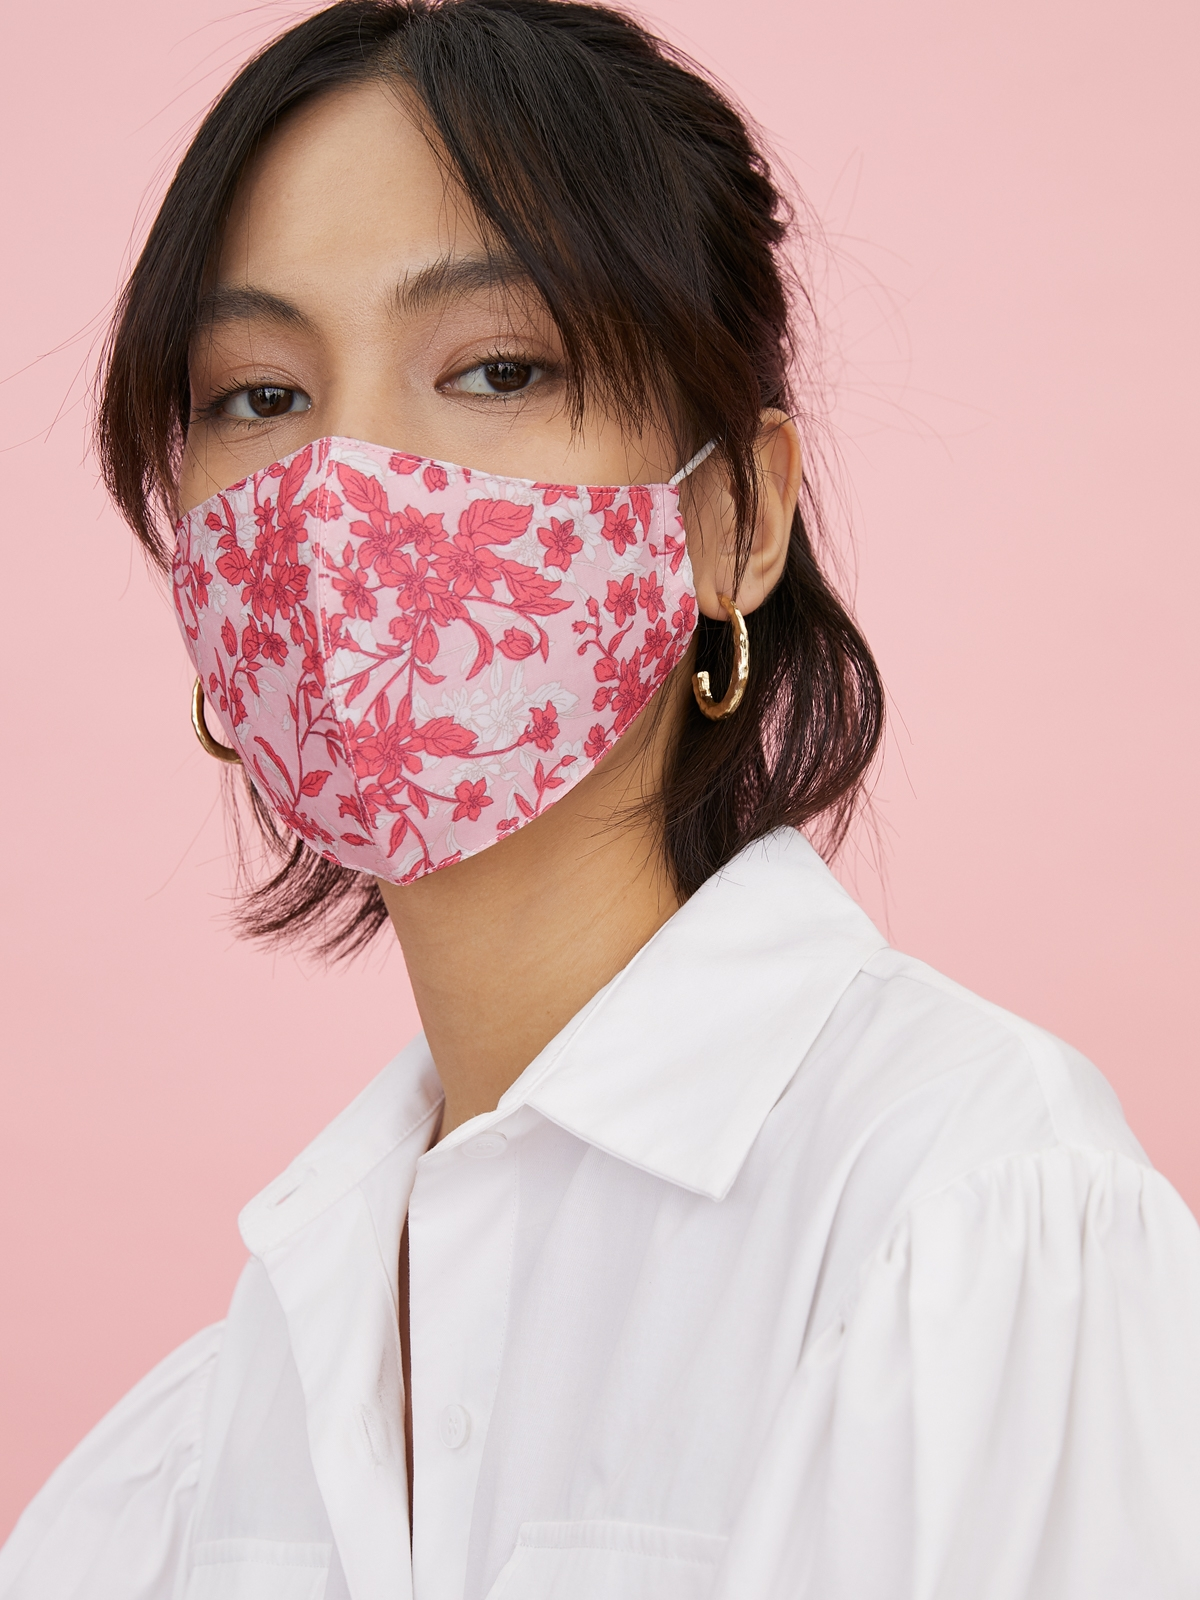 People Triple Defense Layer Reusable Mask Light Pink